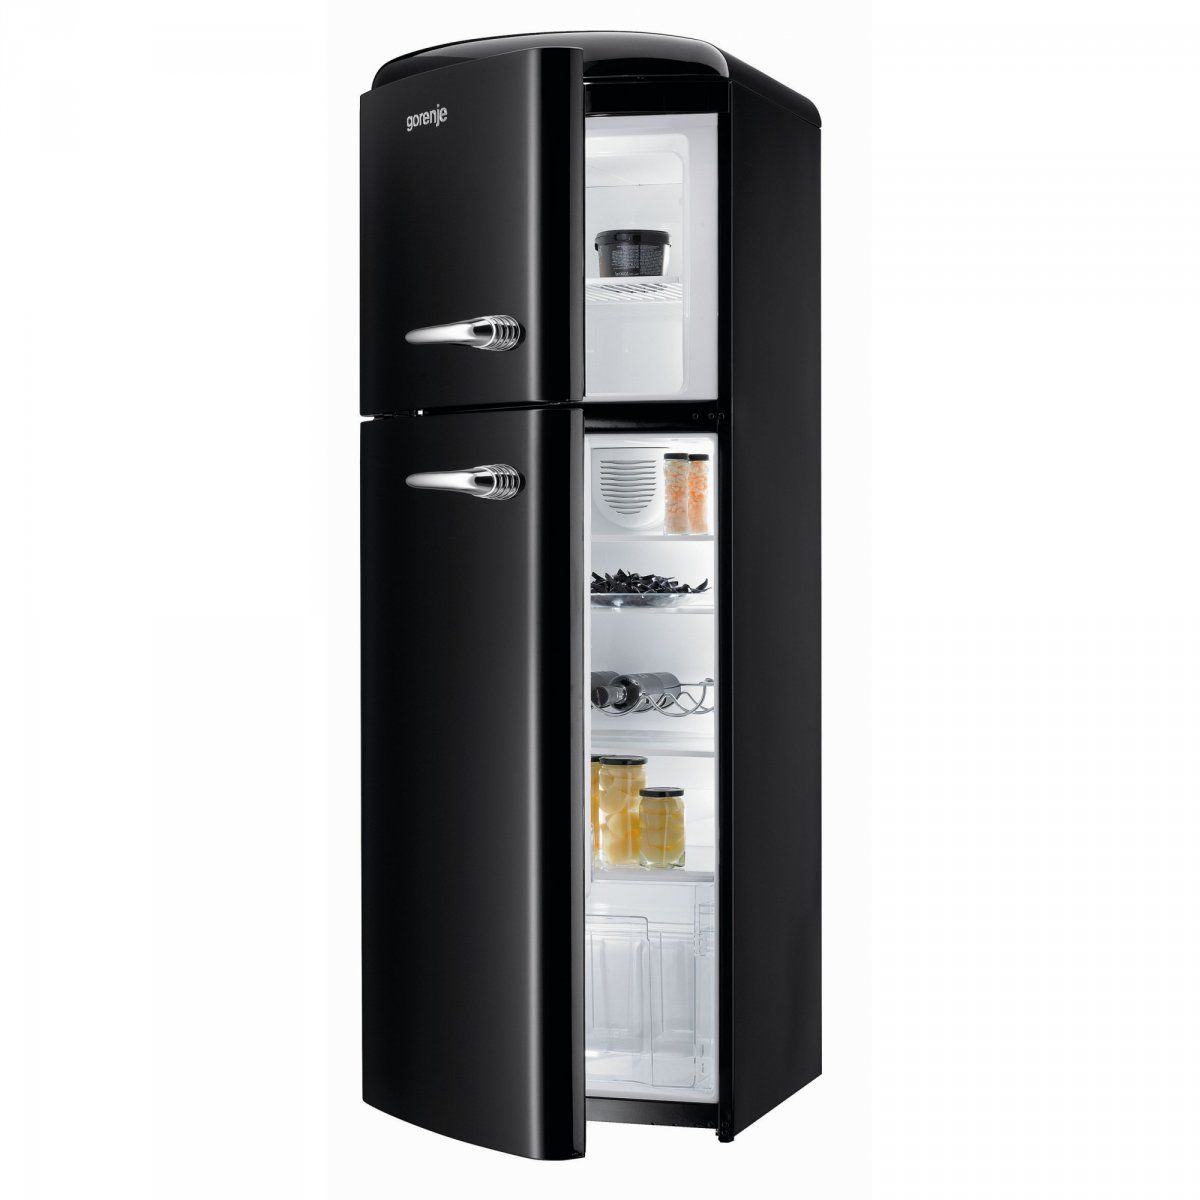 frigorifero a vista freestanding nero